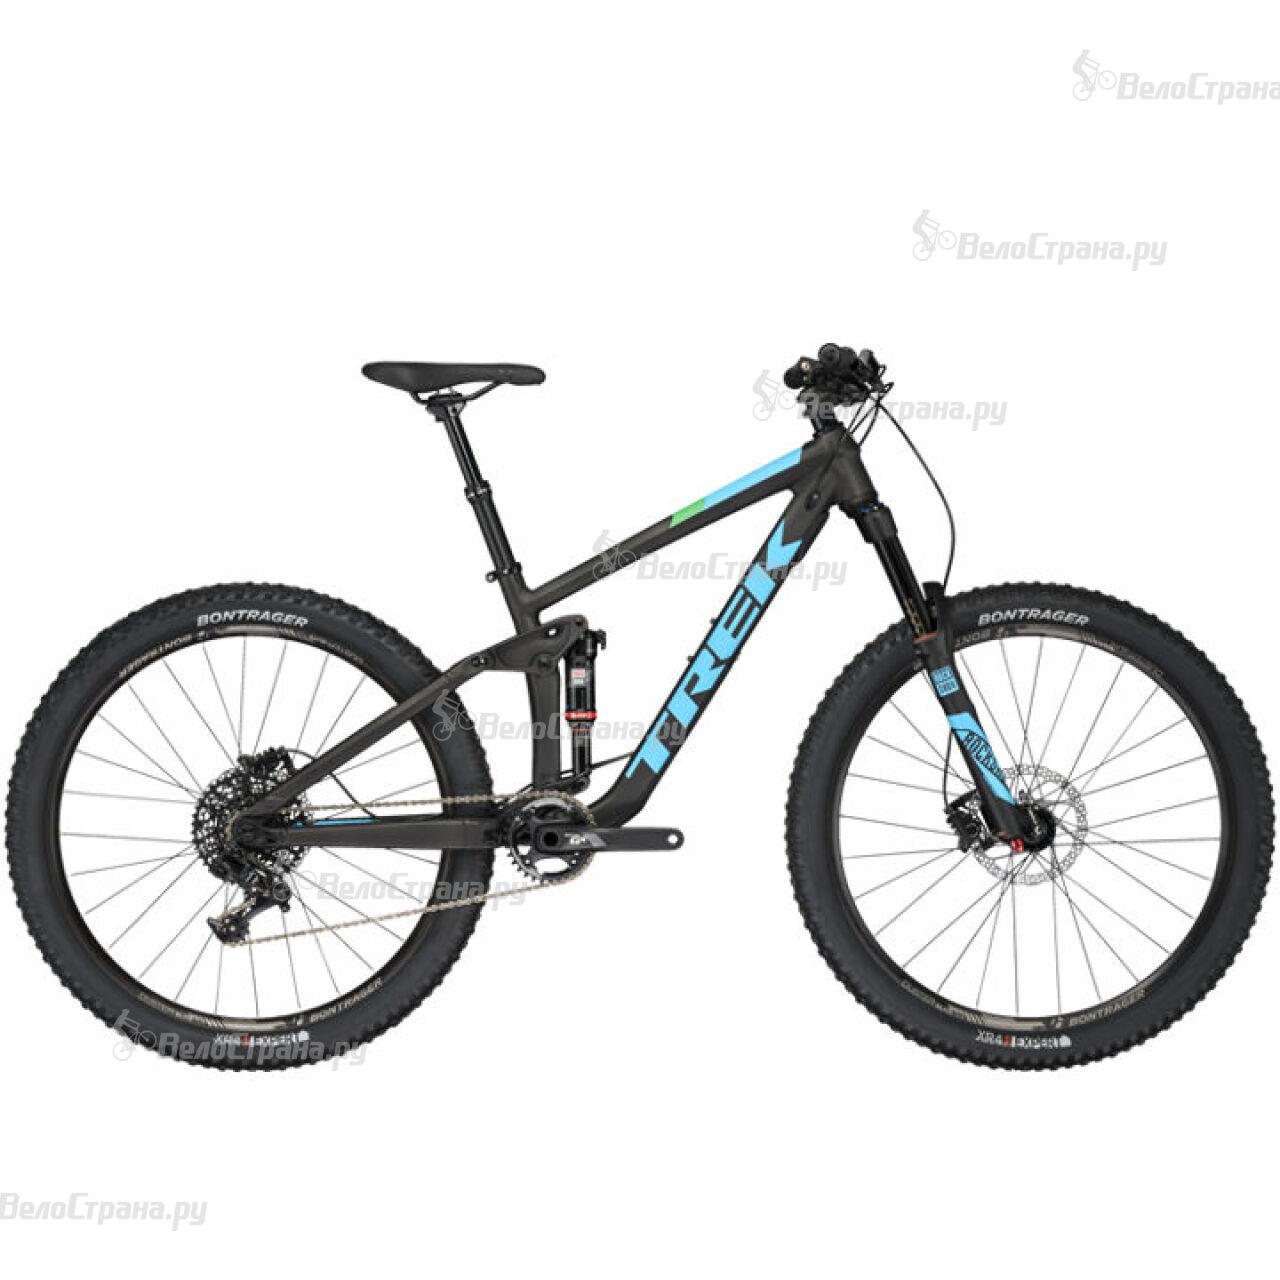 купить Велосипед Trek Remedy 8 27.5 WSD (2017) недорого